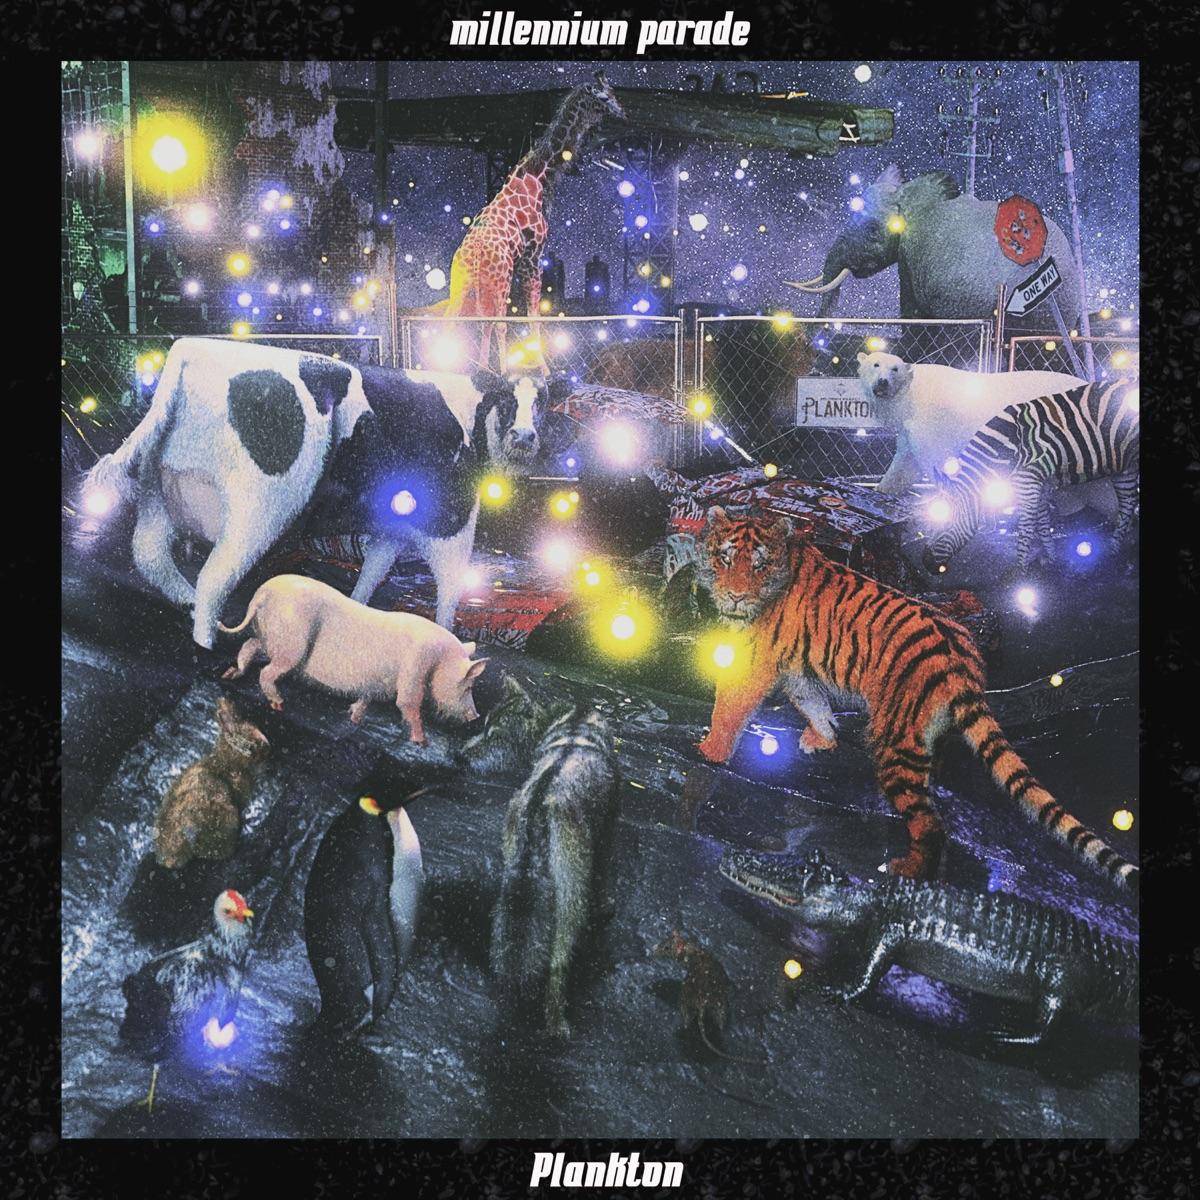 『millennium parade - Plankton』収録の『Plankton』ジャケット